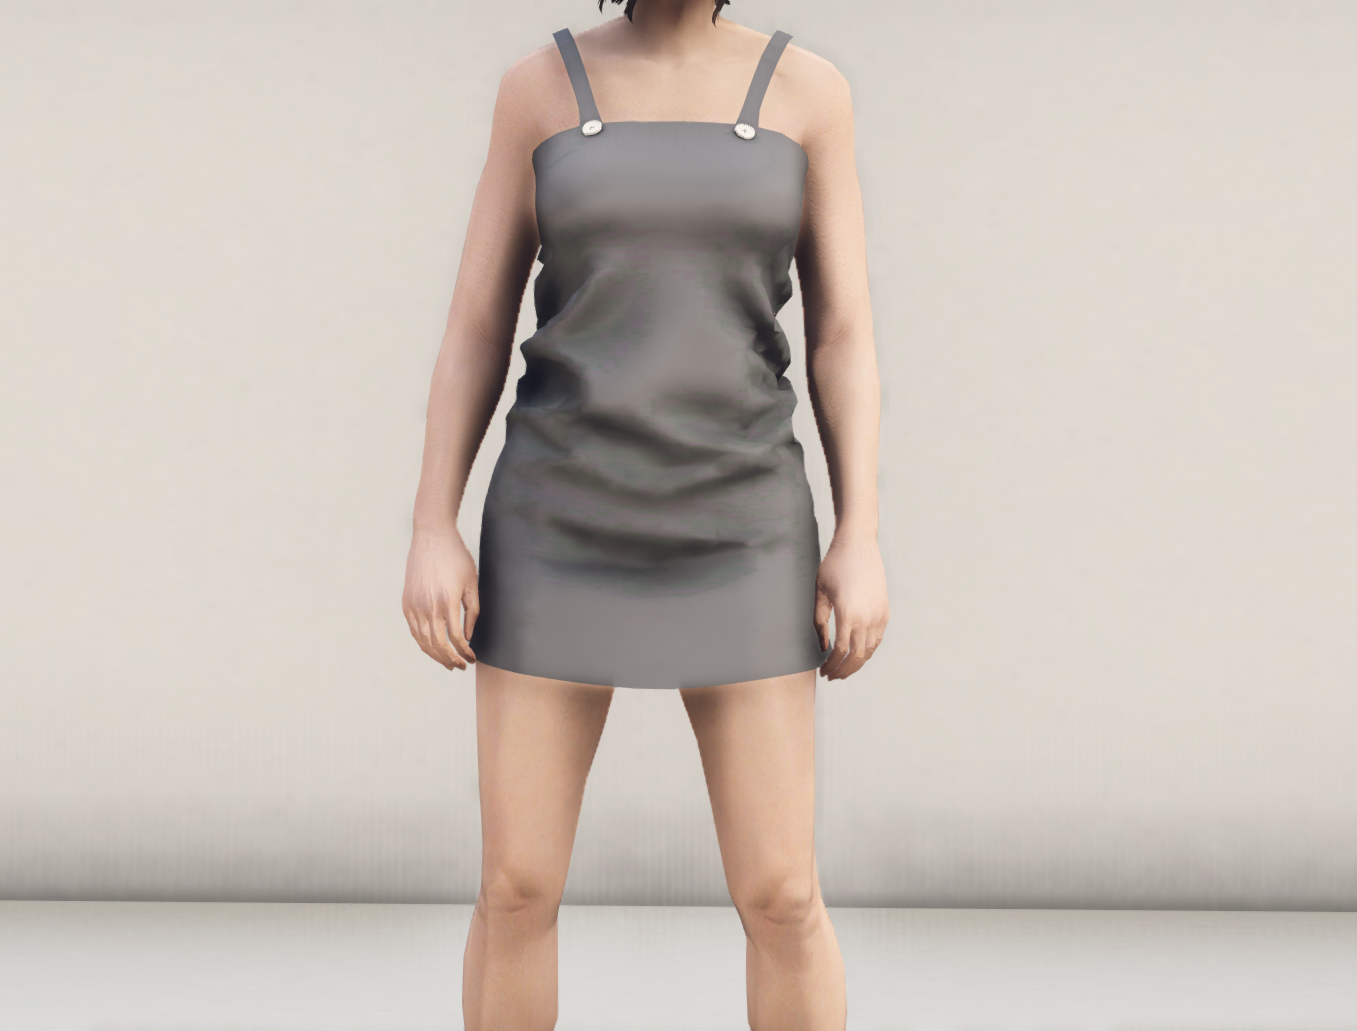 Highwaisted Shorts for MP Female - GTA5-Mods.com